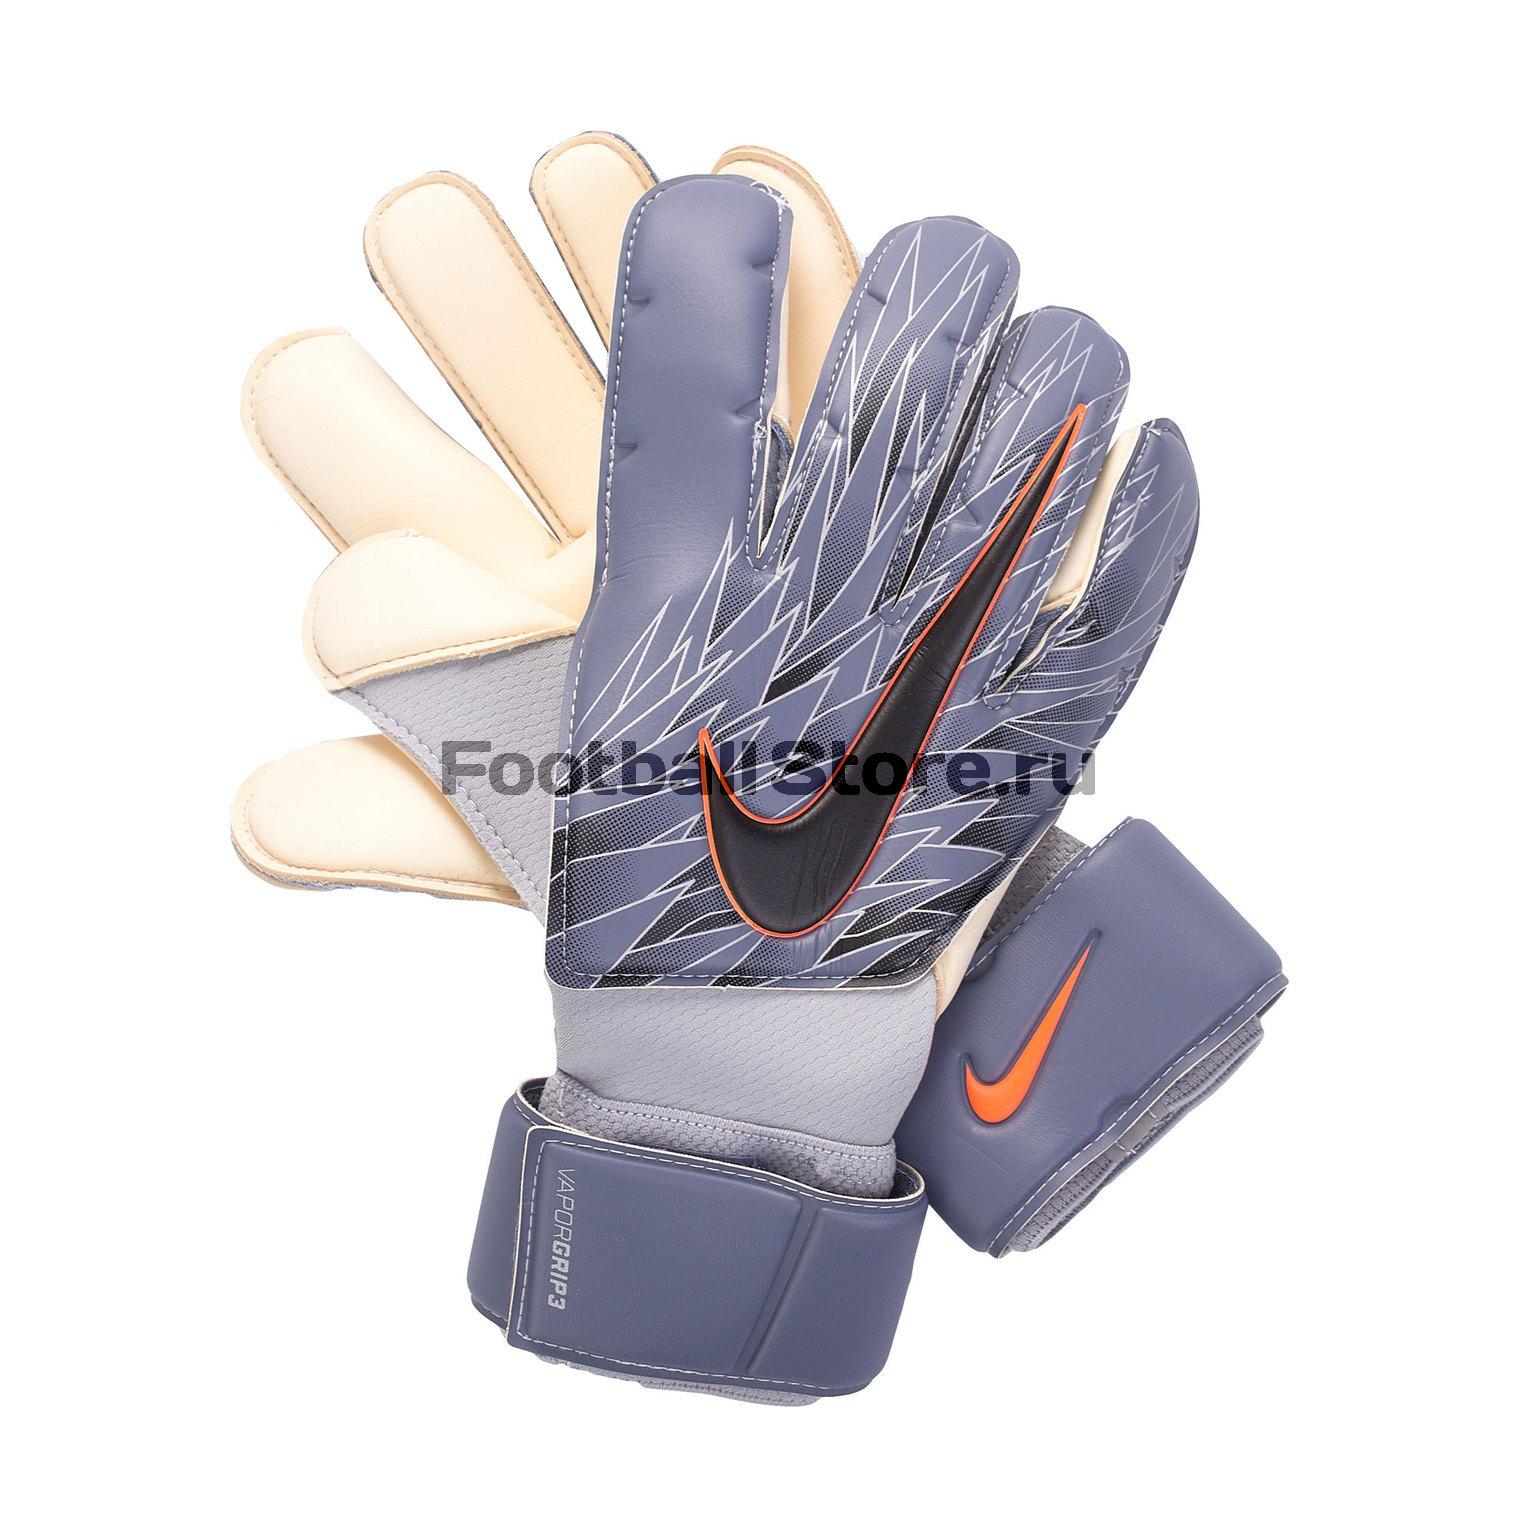 Перчатки вратарские Nike Vapor Grip 3 GS3373-490 nike nike push up grip 2 0